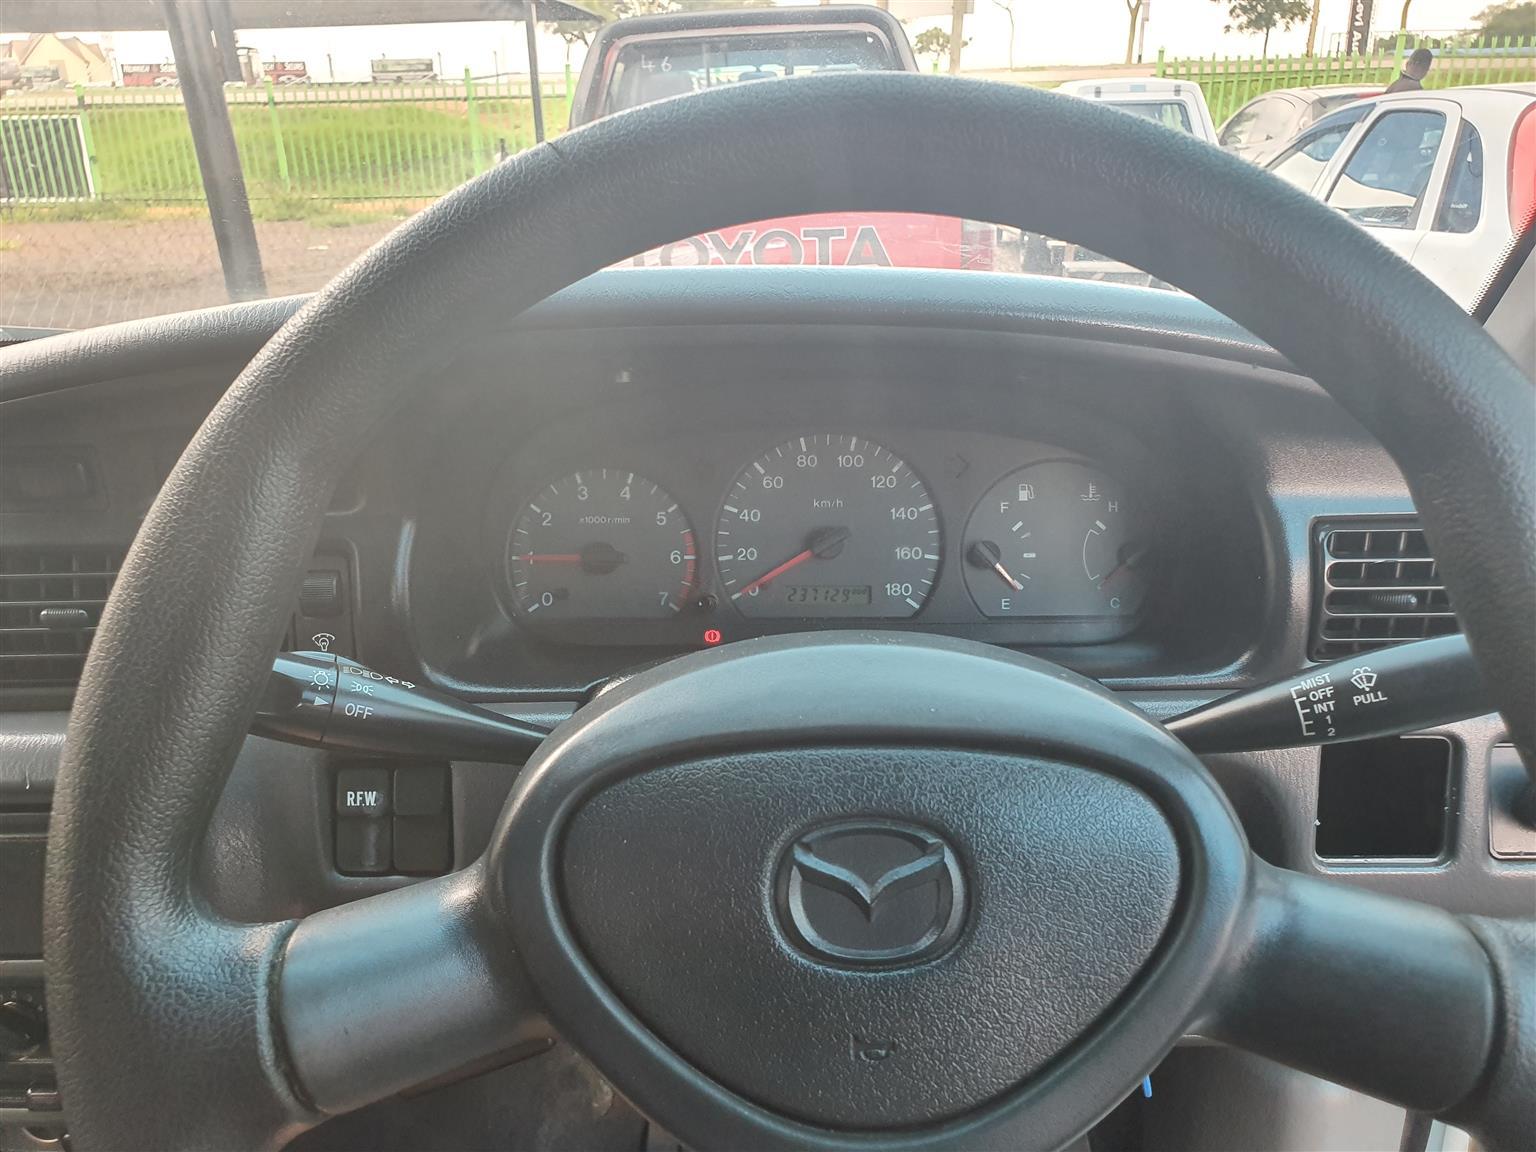 2006 Mazda Drifter B2600 4x4 double cab SLE